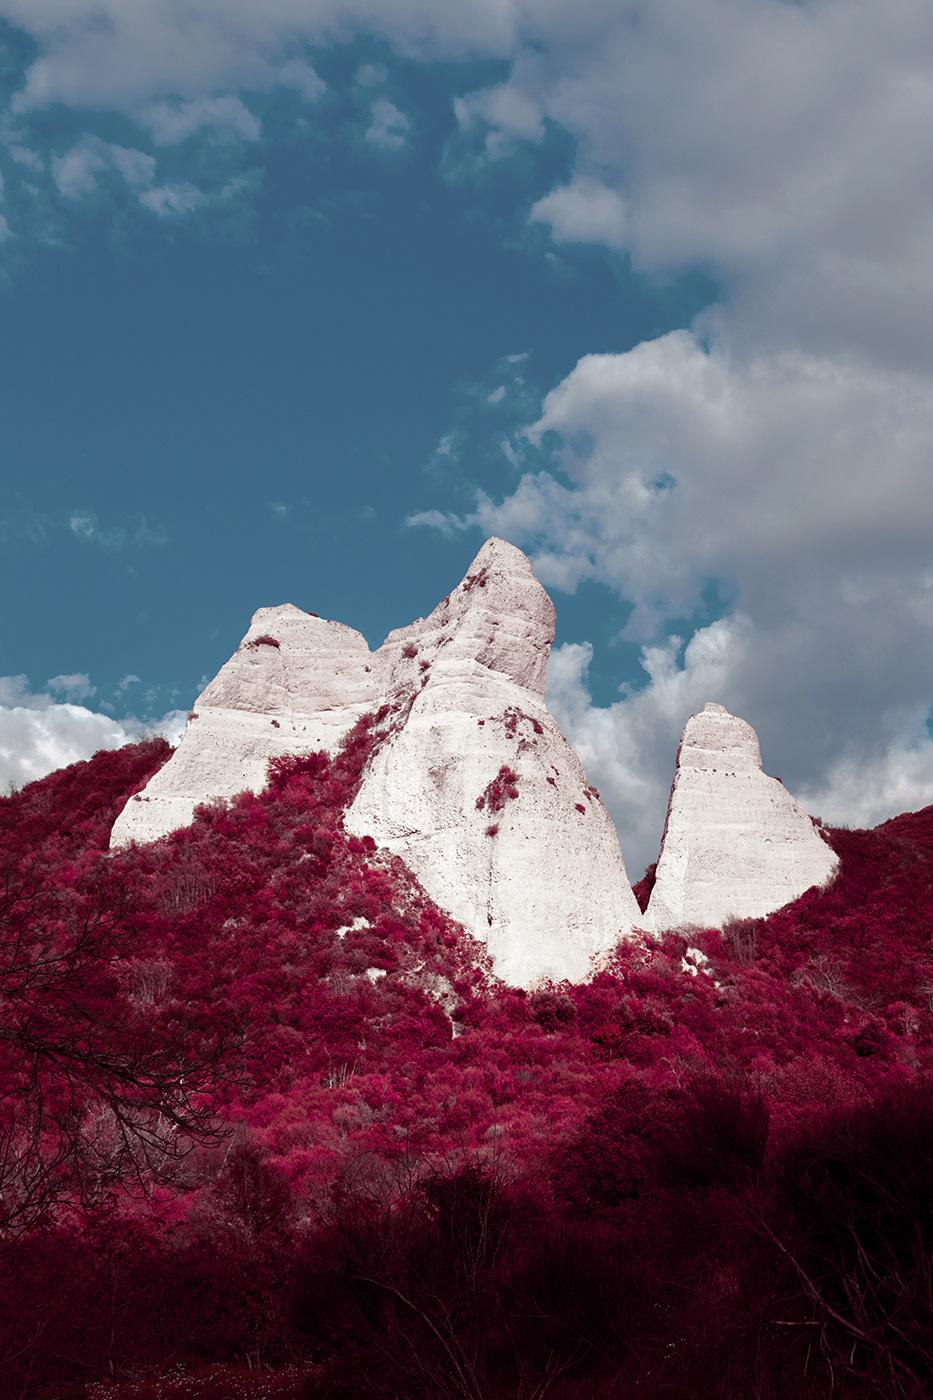 Nature red cold Hot mood mountain river emotion Landscape Minimalism